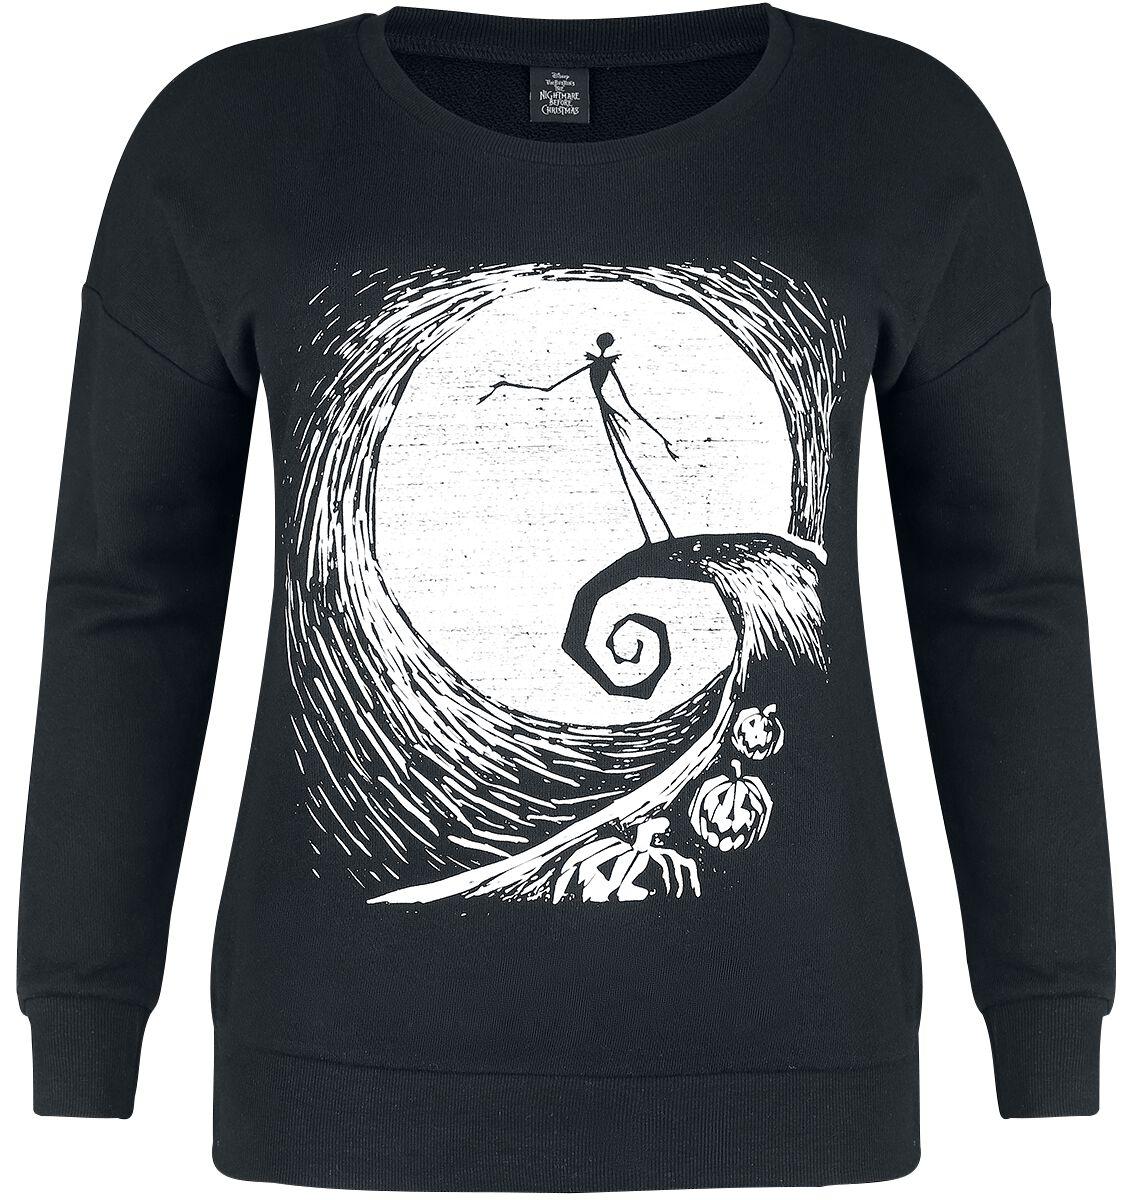 Image of   The Nightmare Before Christmas Pumpkin Hill Girlie sweatshirt sort